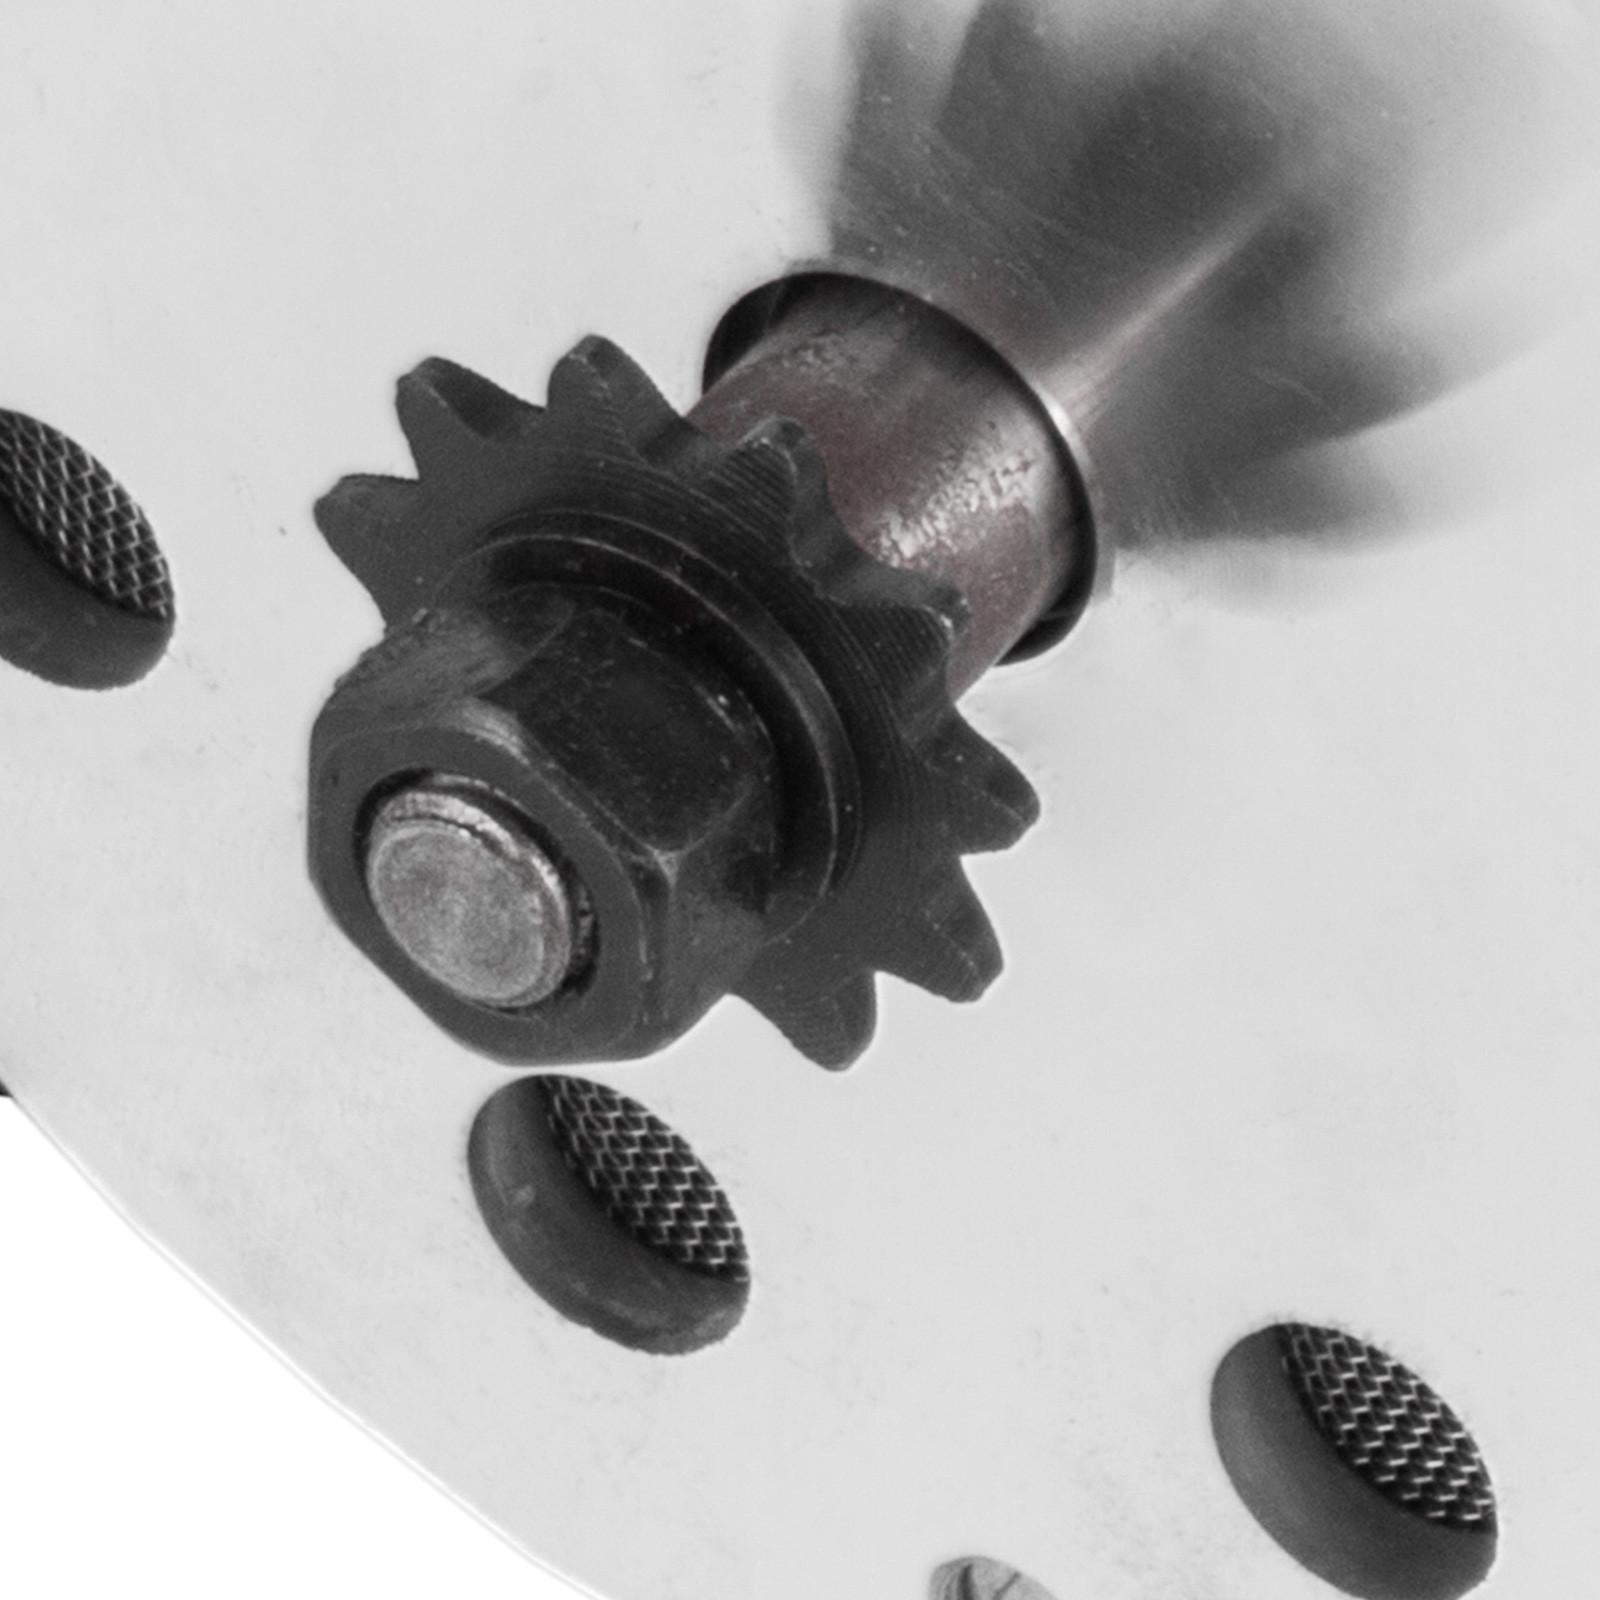 36v-Electric-Motor-controller-throttle-kit-f-Scooter-E-Scooter-ATV-Permanent thumbnail 83